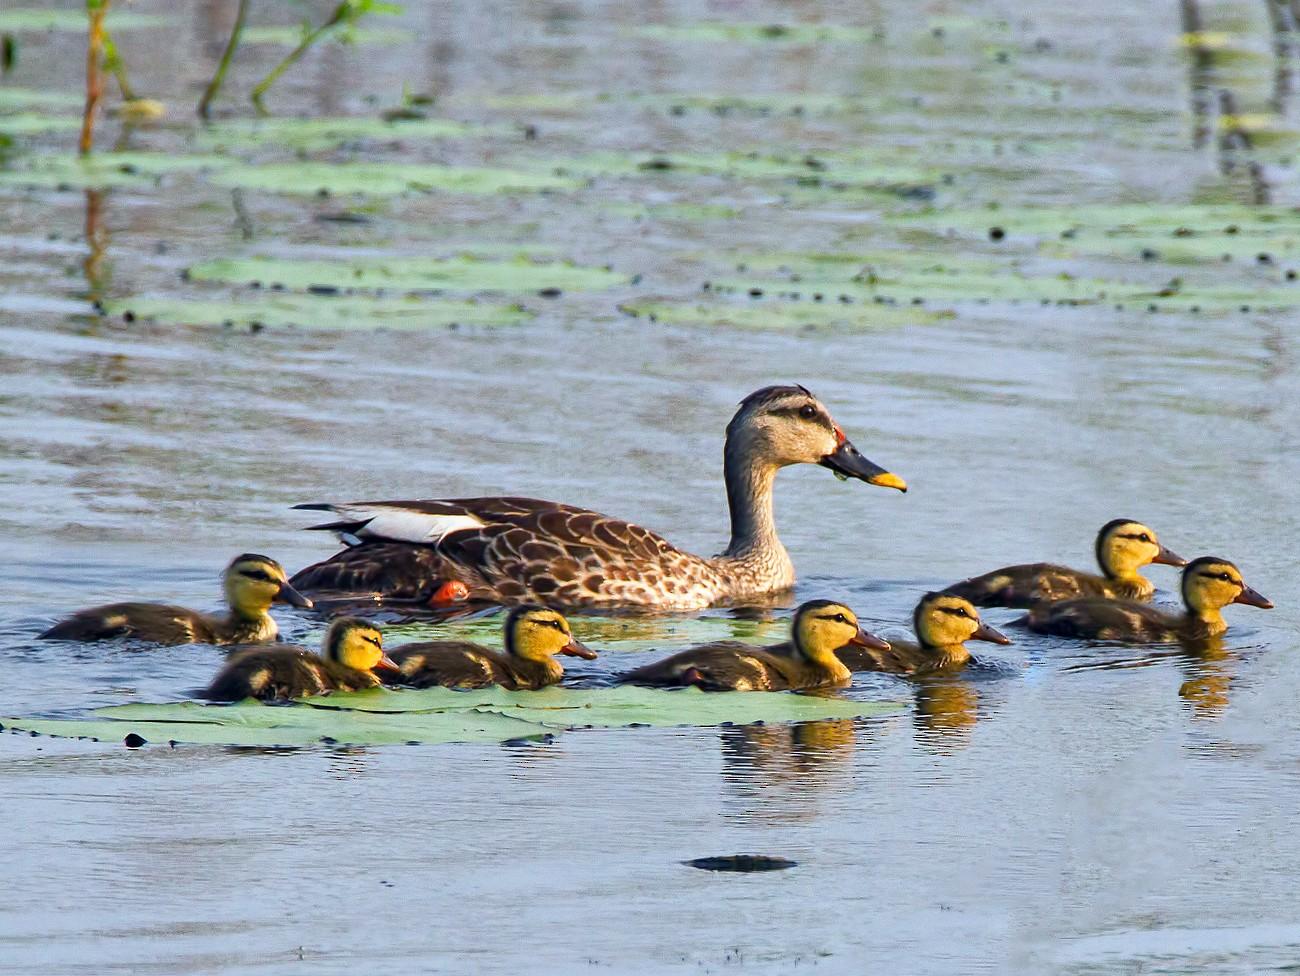 Indian Spot-billed Duck - Muthu Narayanan